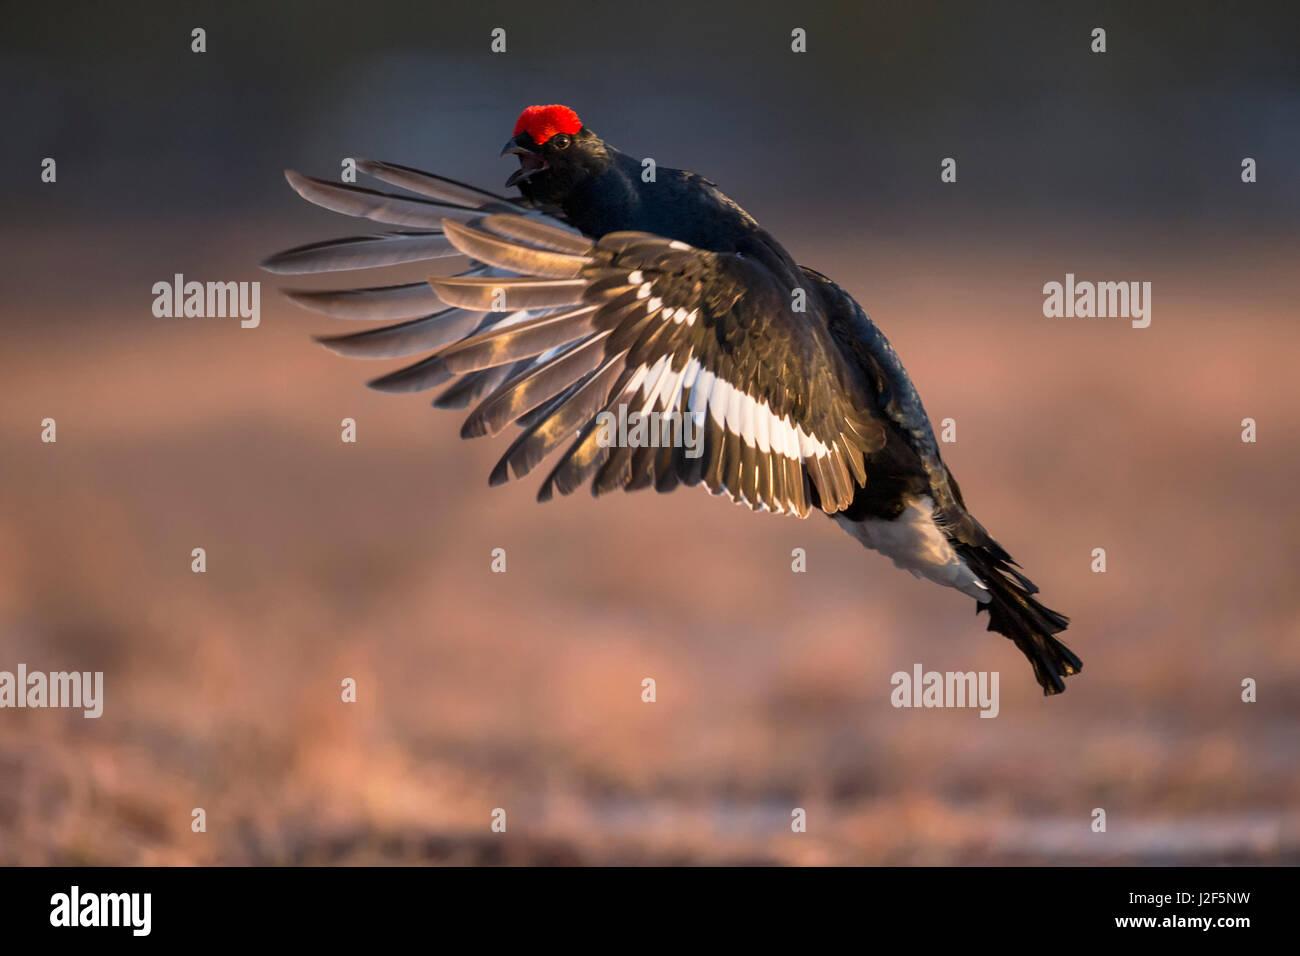 Flying Black Grouse (Lyrurus tetrix) in winter landscape - Stock Image